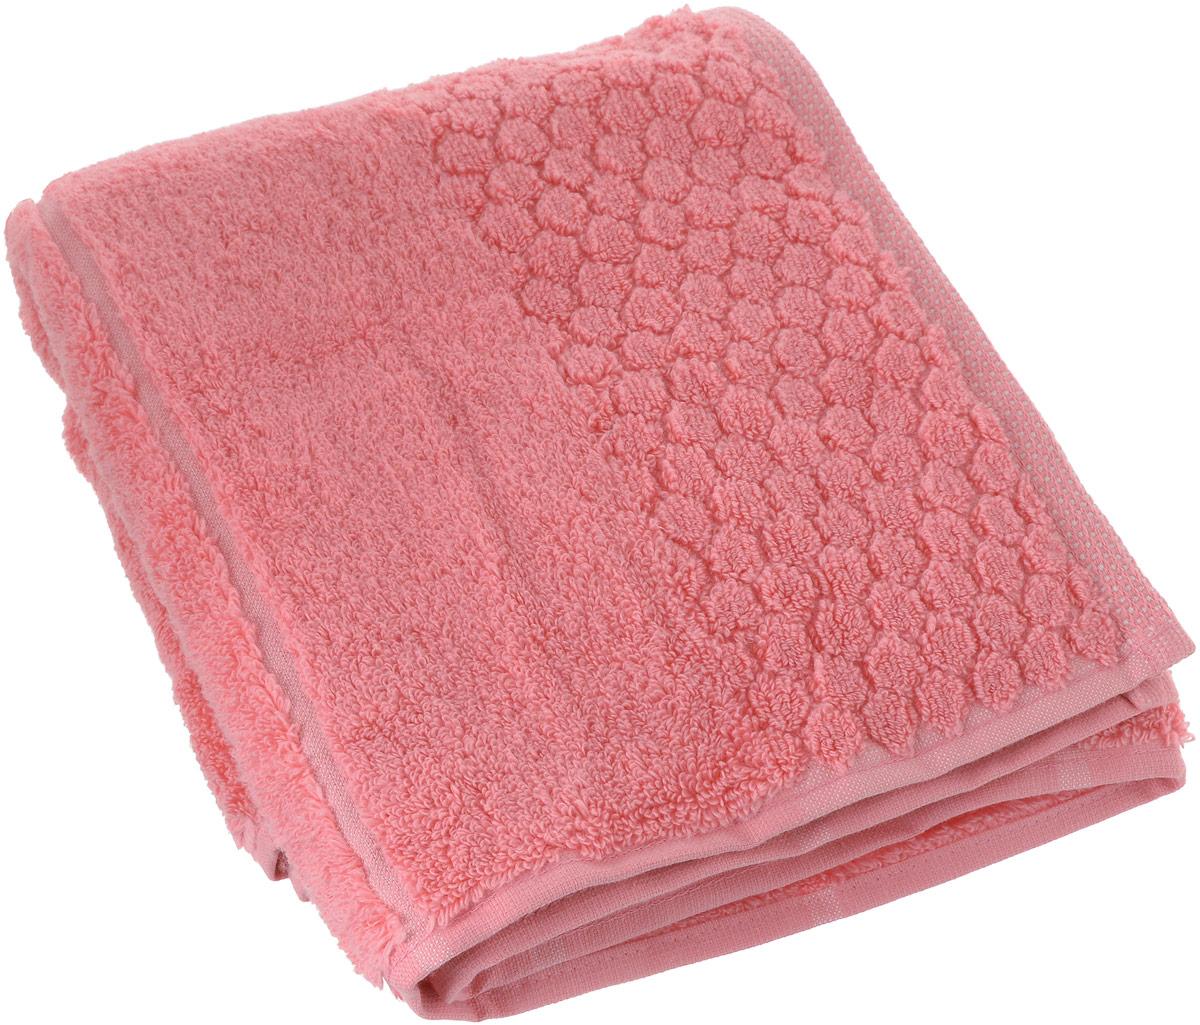 Полотенце Arya Vesper, цвет: коралловый, 50 x 90 см полотенца банные arya полотенце arya maxi crest